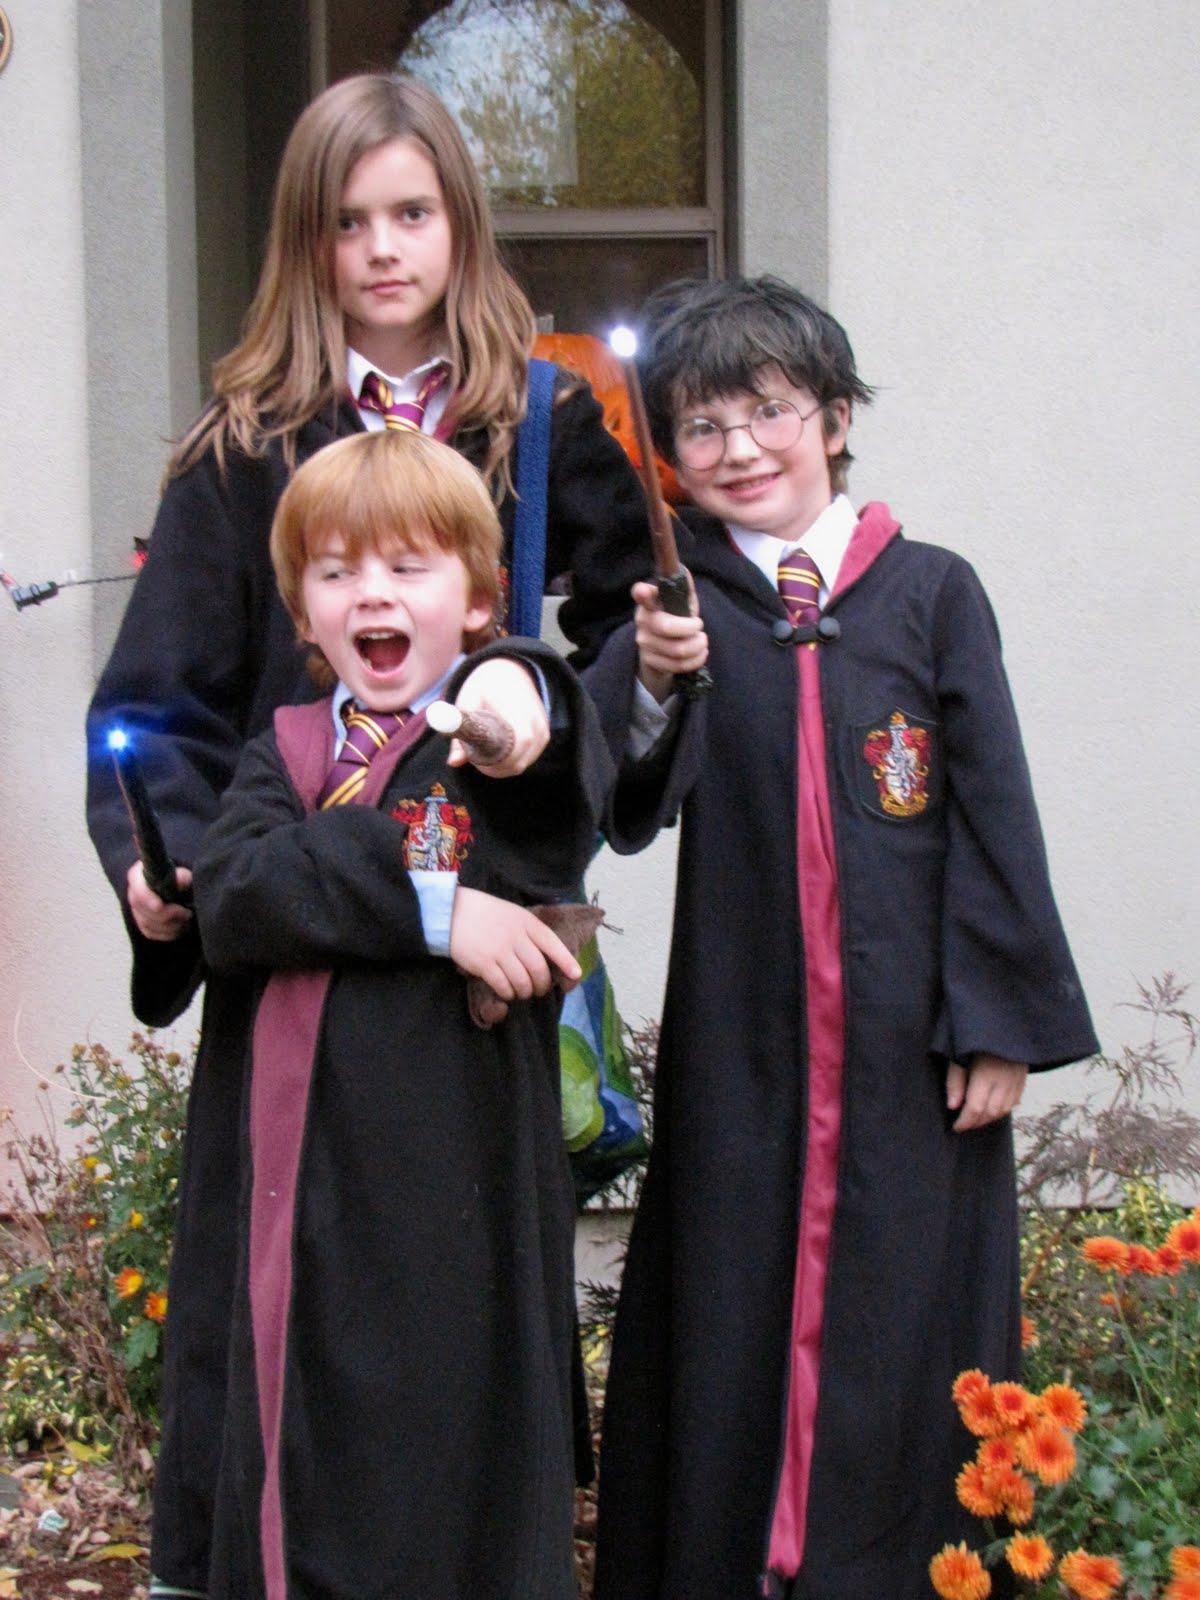 Williams fam 5 halloween 2010 - Hermione granger and ron weasley kids ...